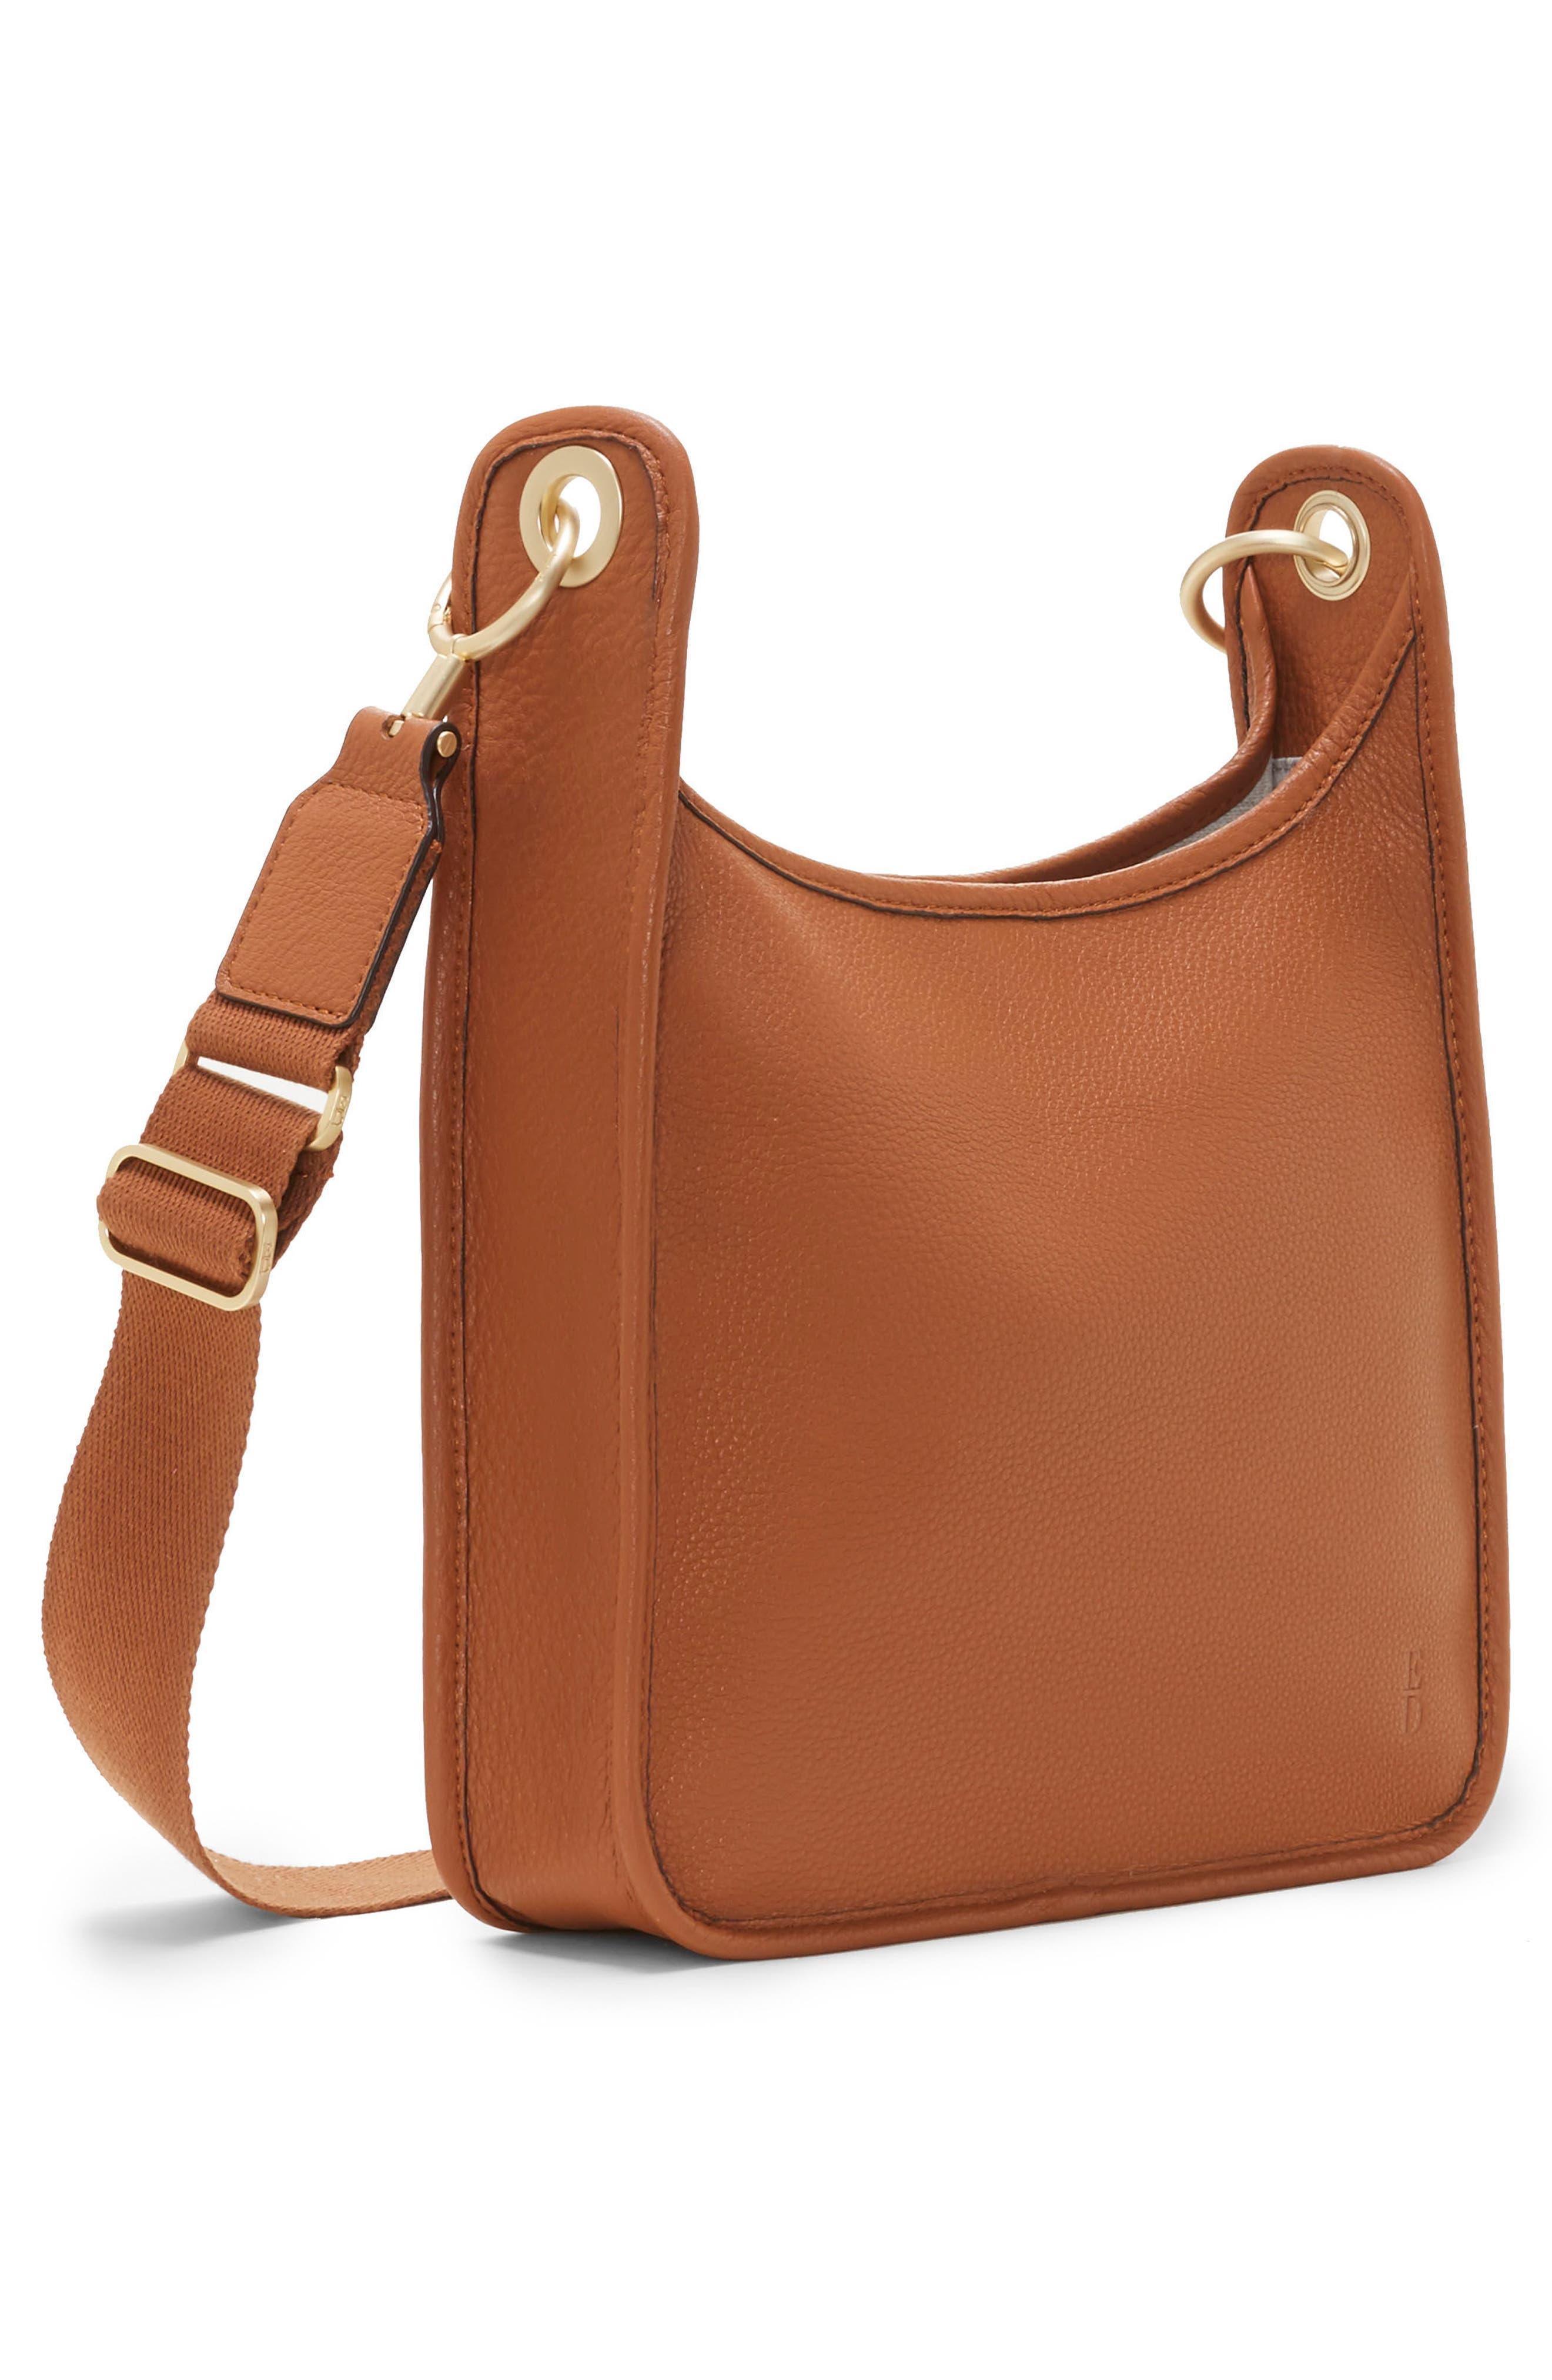 Leather Crossbody Bag,                             Alternate thumbnail 4, color,                             201